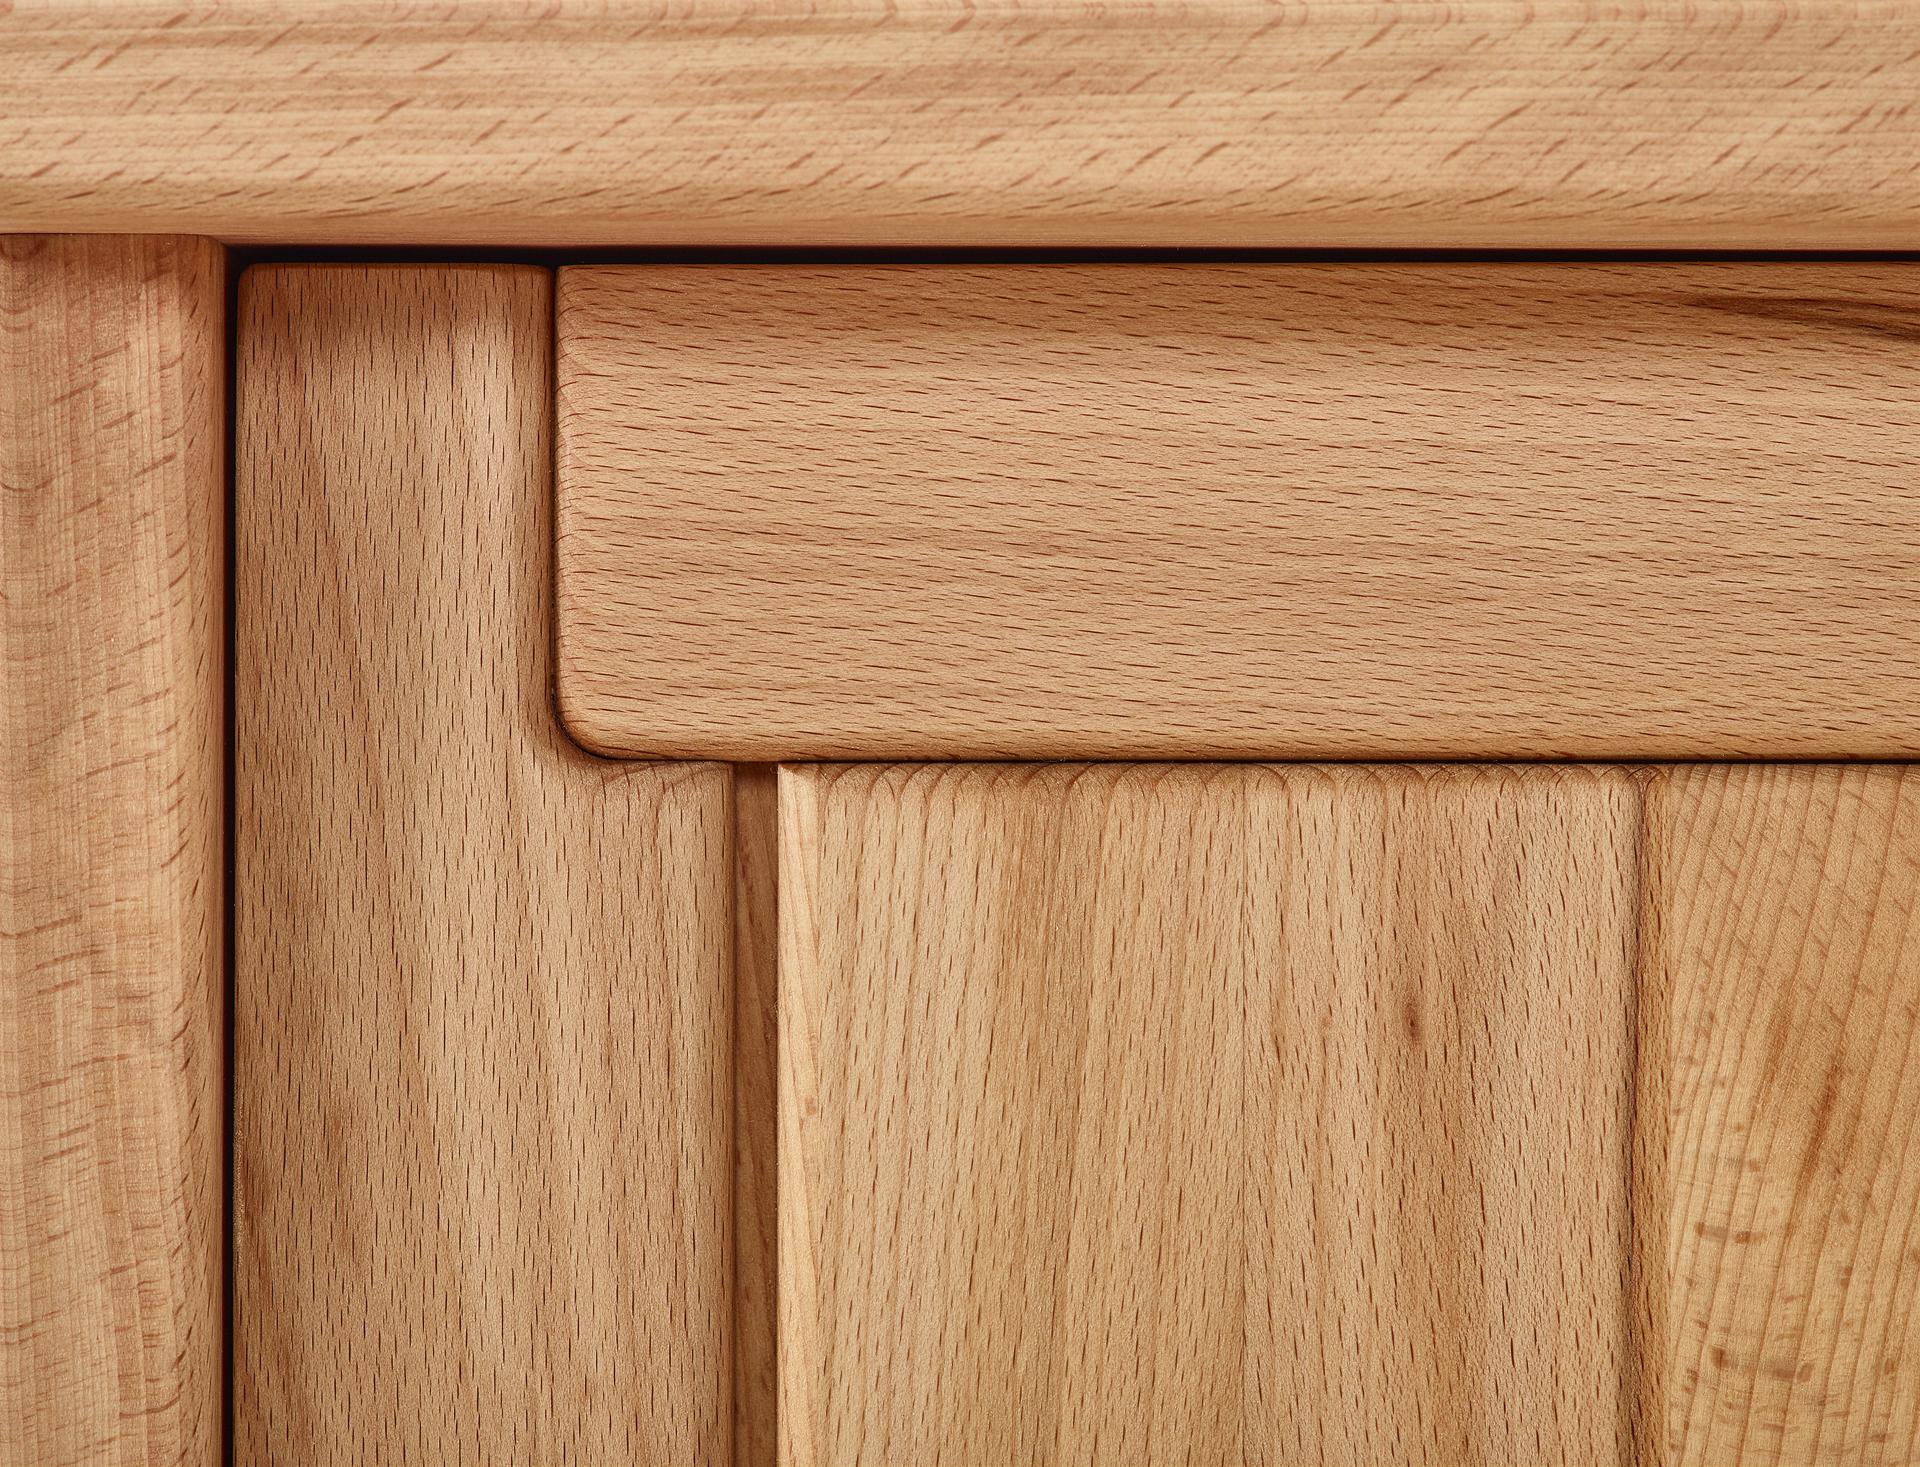 framedoor-detail-www